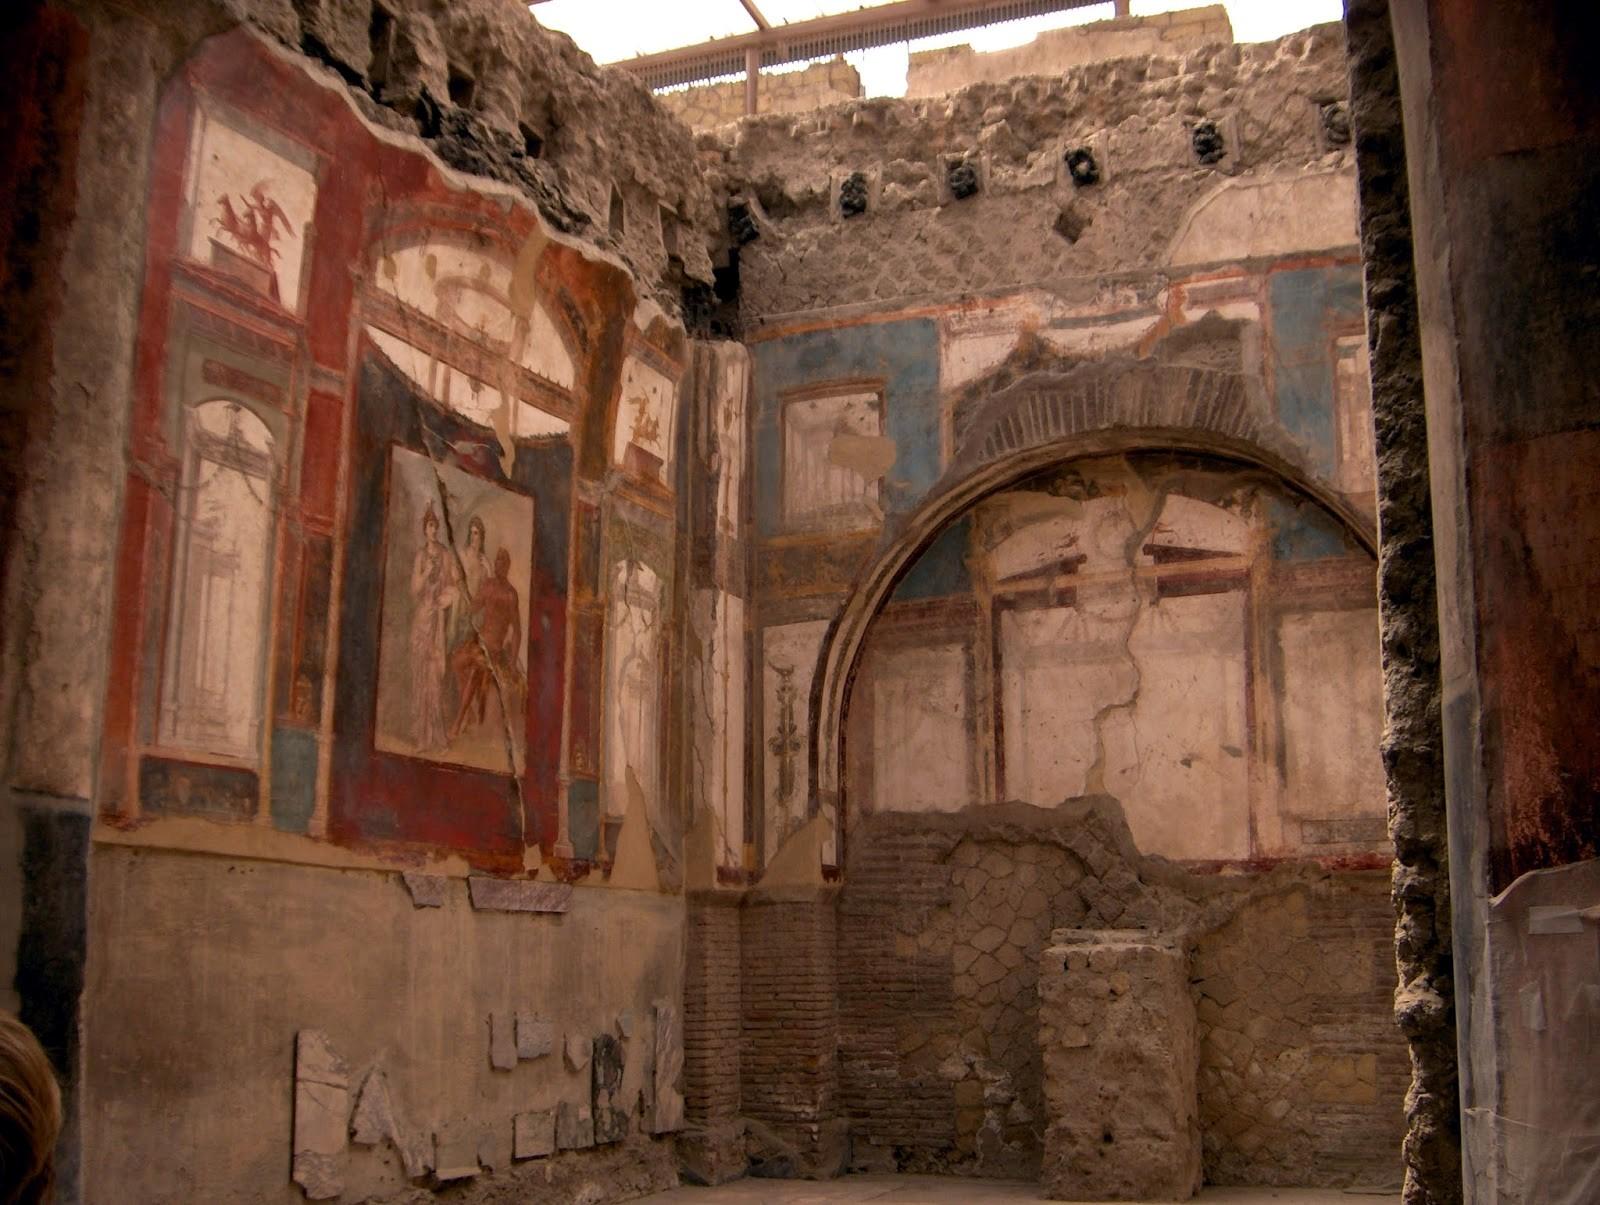 Pompeii, Herculaneum, Italy, Naples, Vesuvius, ancient roam, Romans, Italia, holiday, visiting Pompeii, How to get to Pompeii, tips, vacation, Sorrento, travel, travelling, Europe, backpacking,